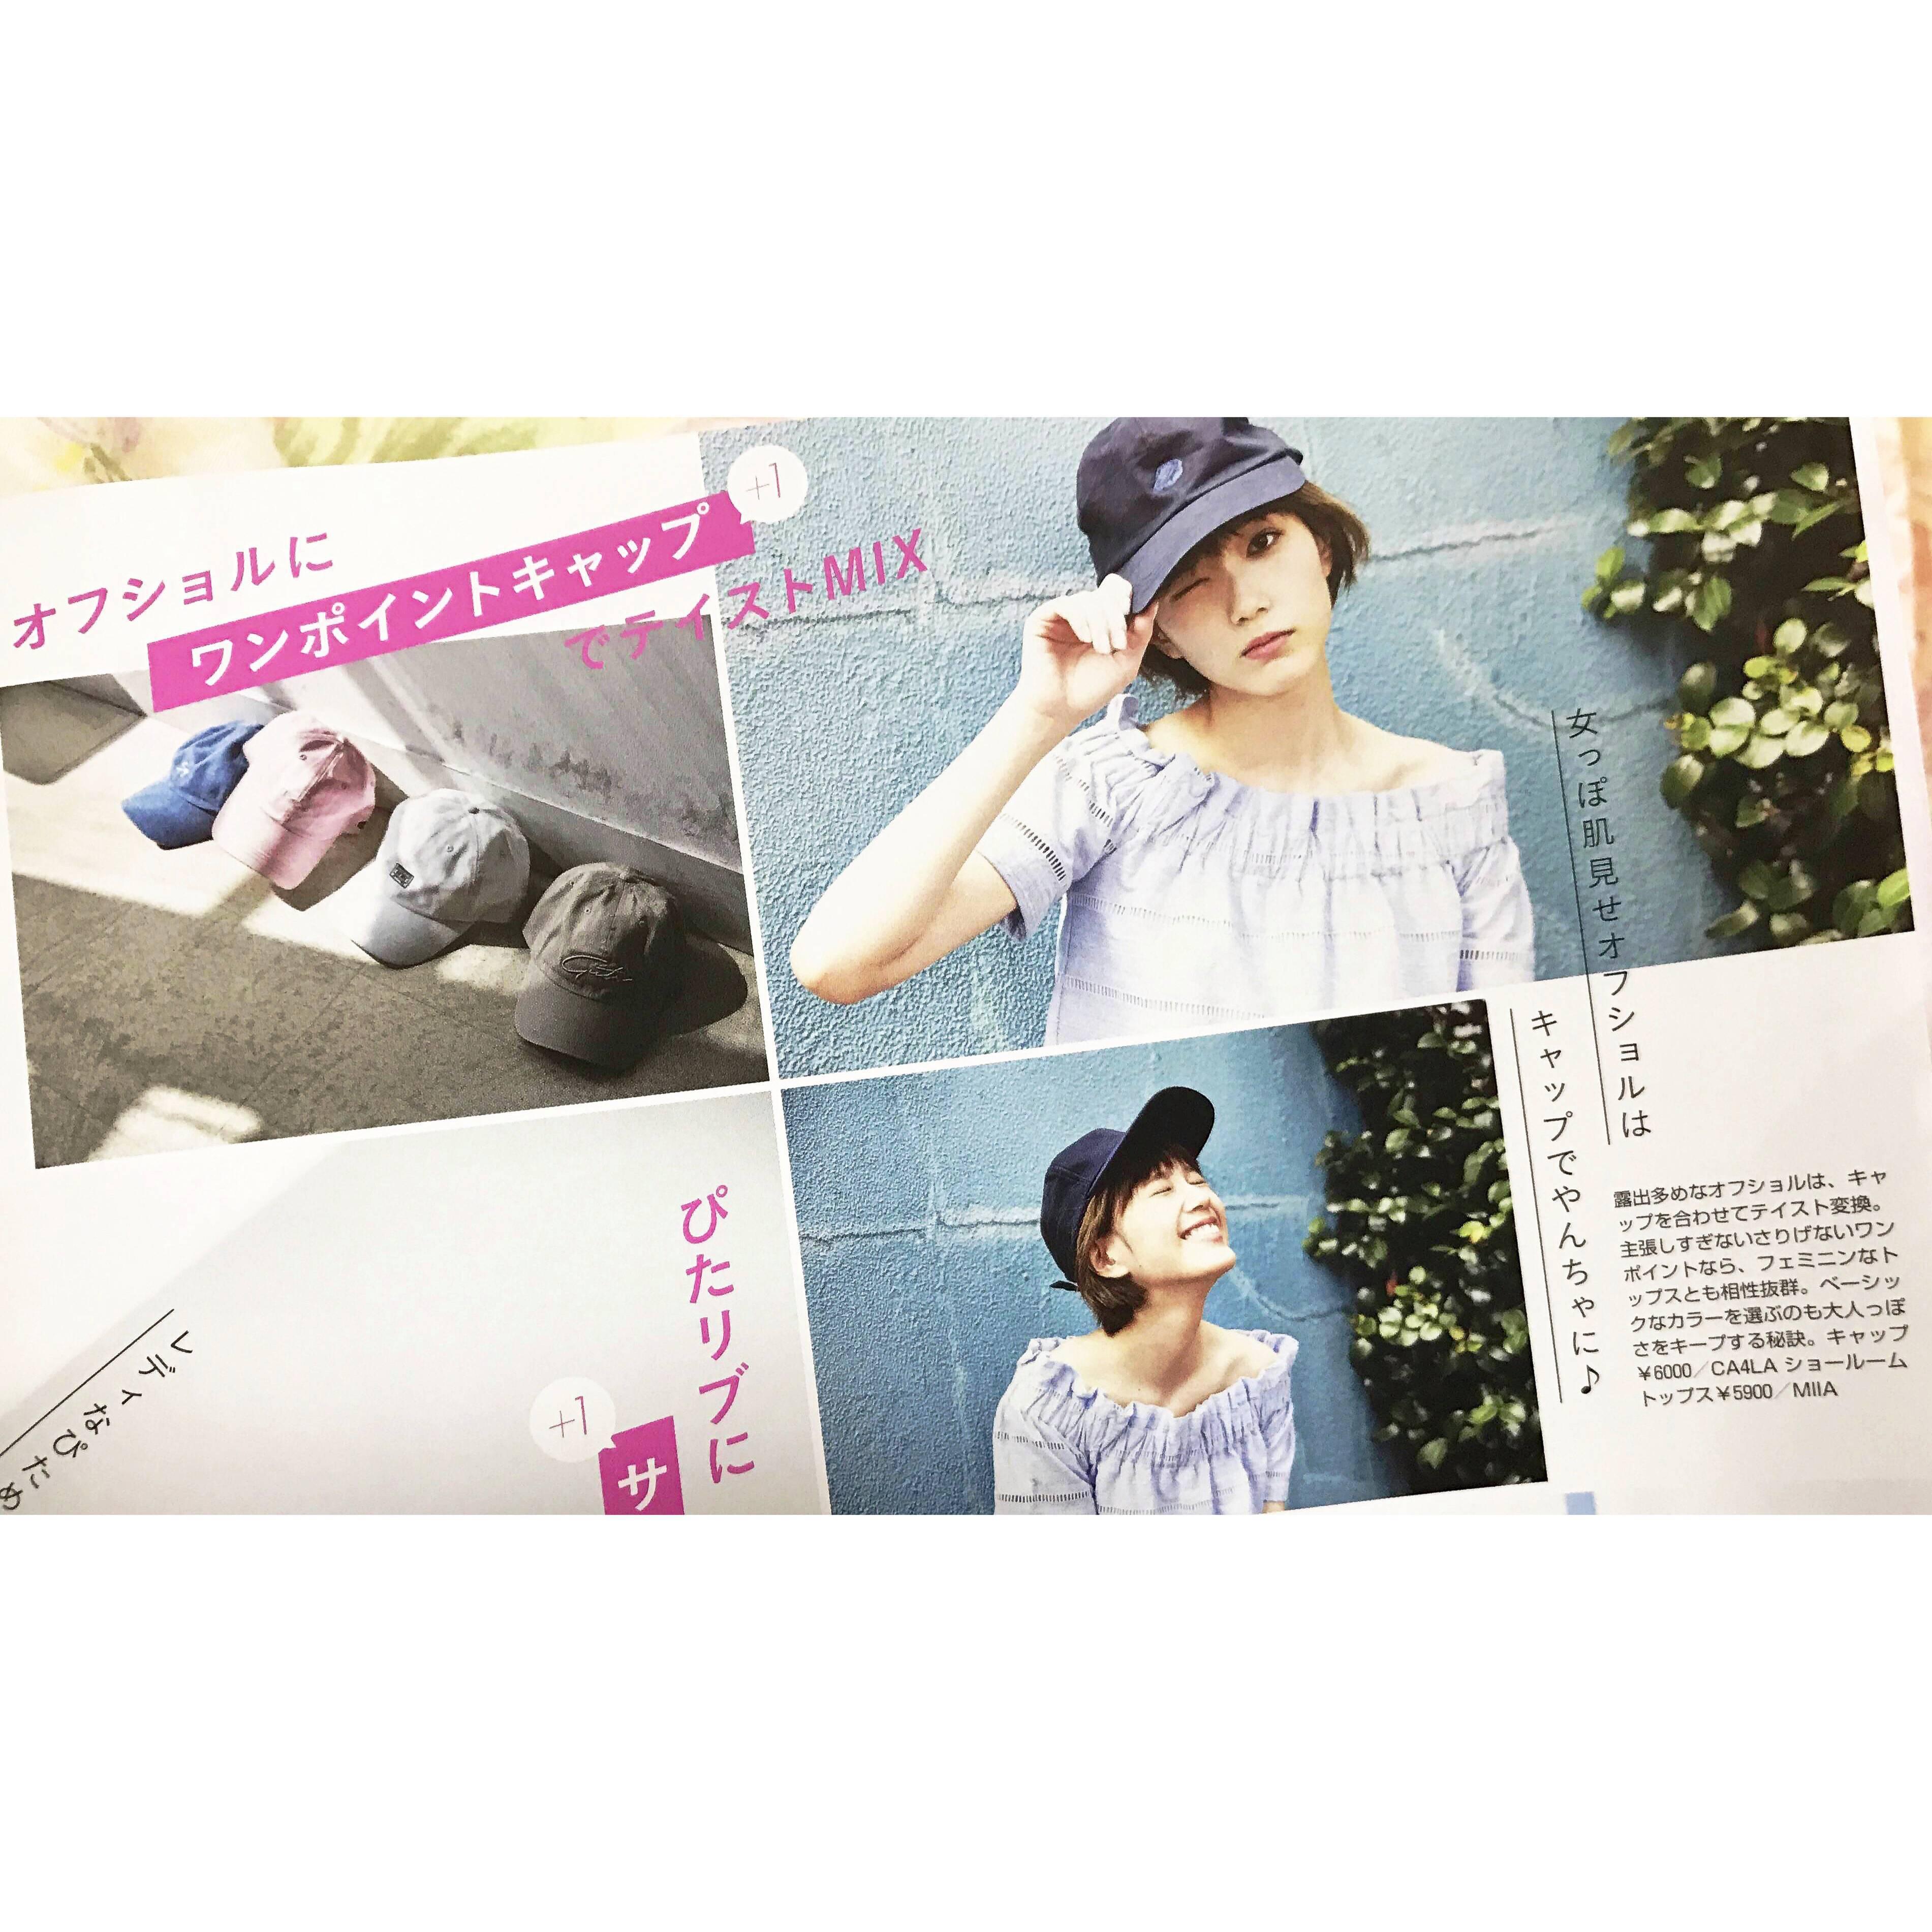 Vol.8♡ 男女ウケ間違いなし!【カジュアルモテ】ファッションとは!?_1_6